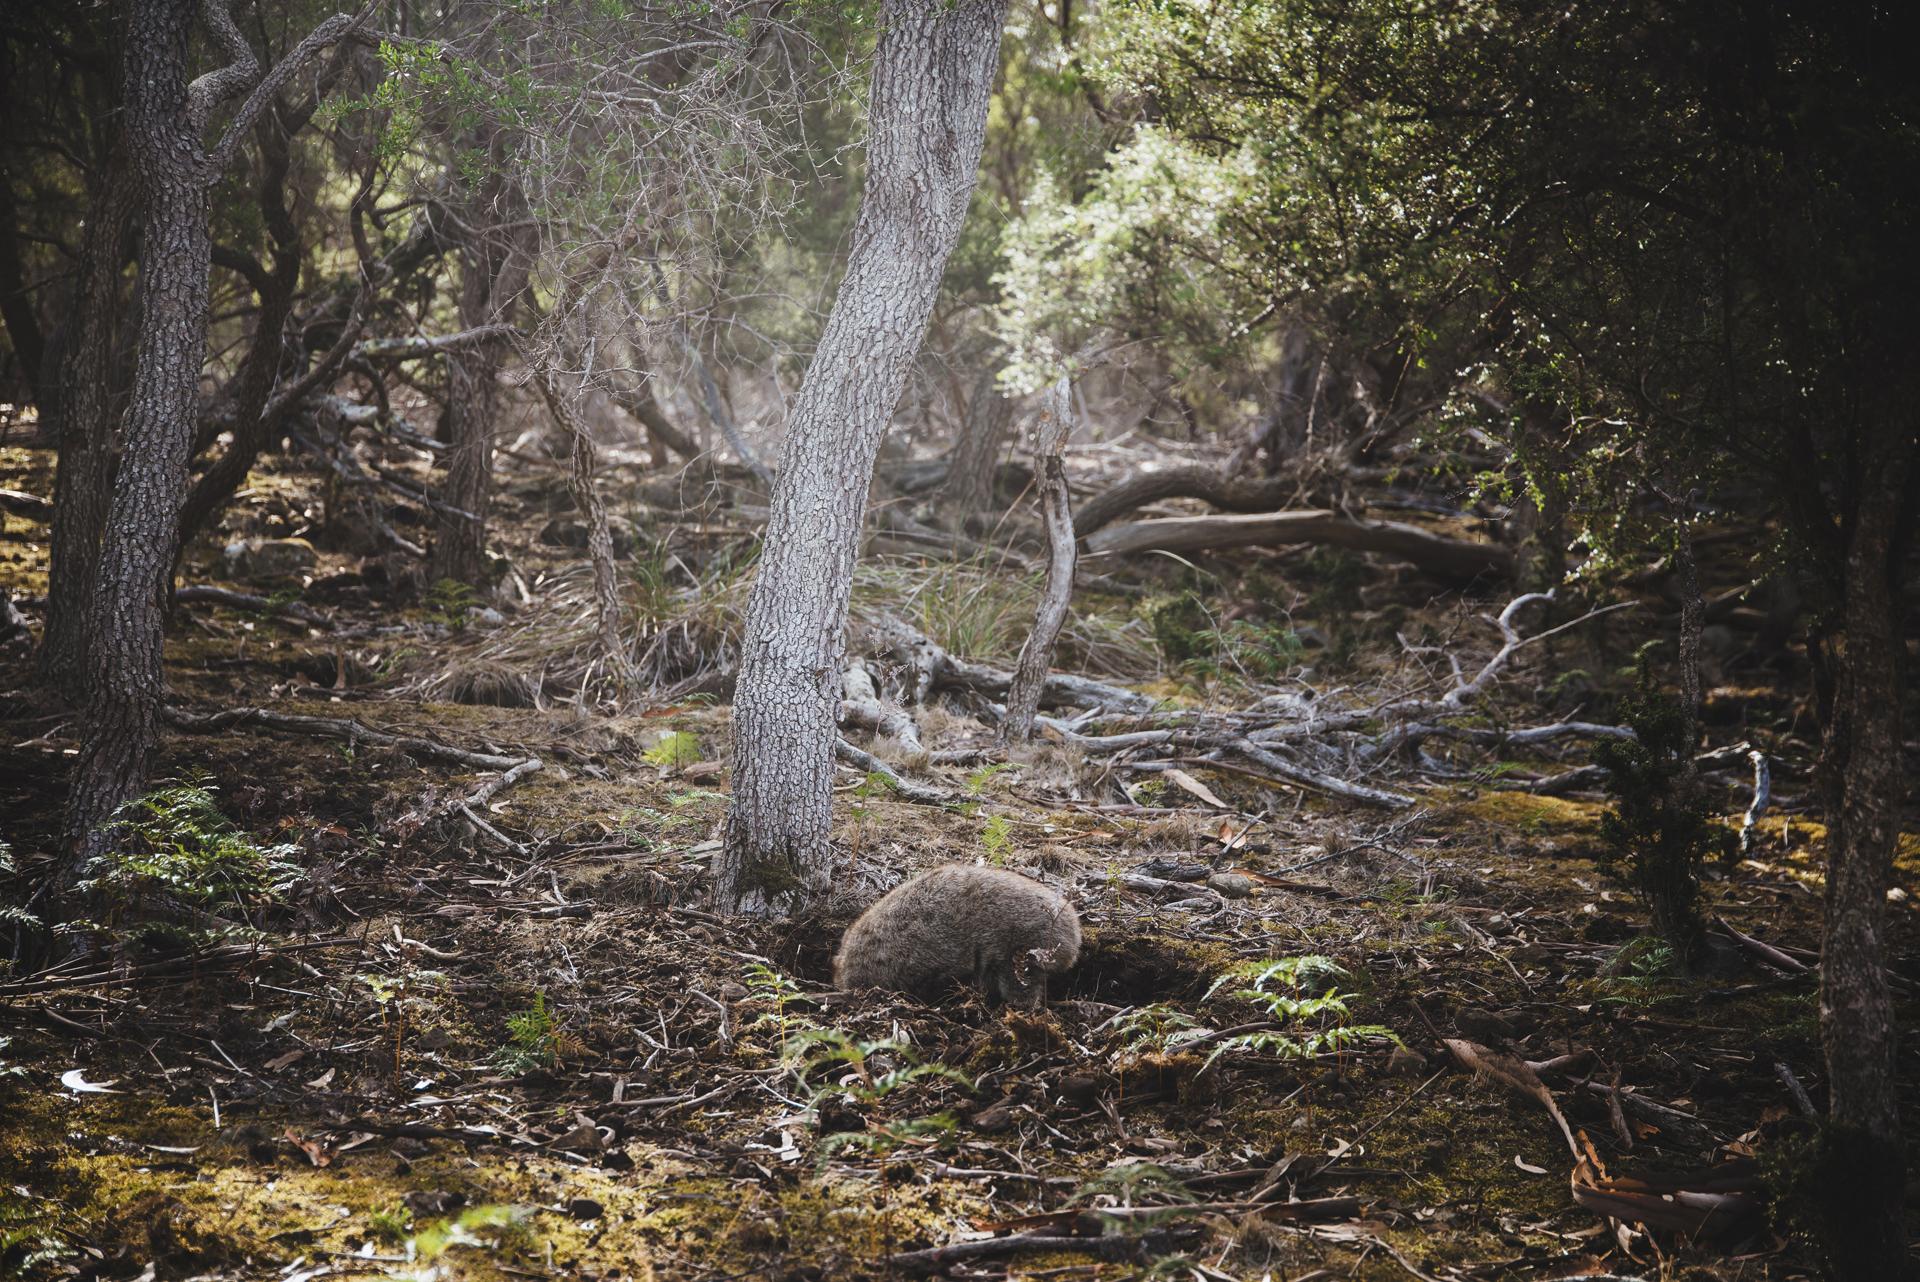 tasmania wombat